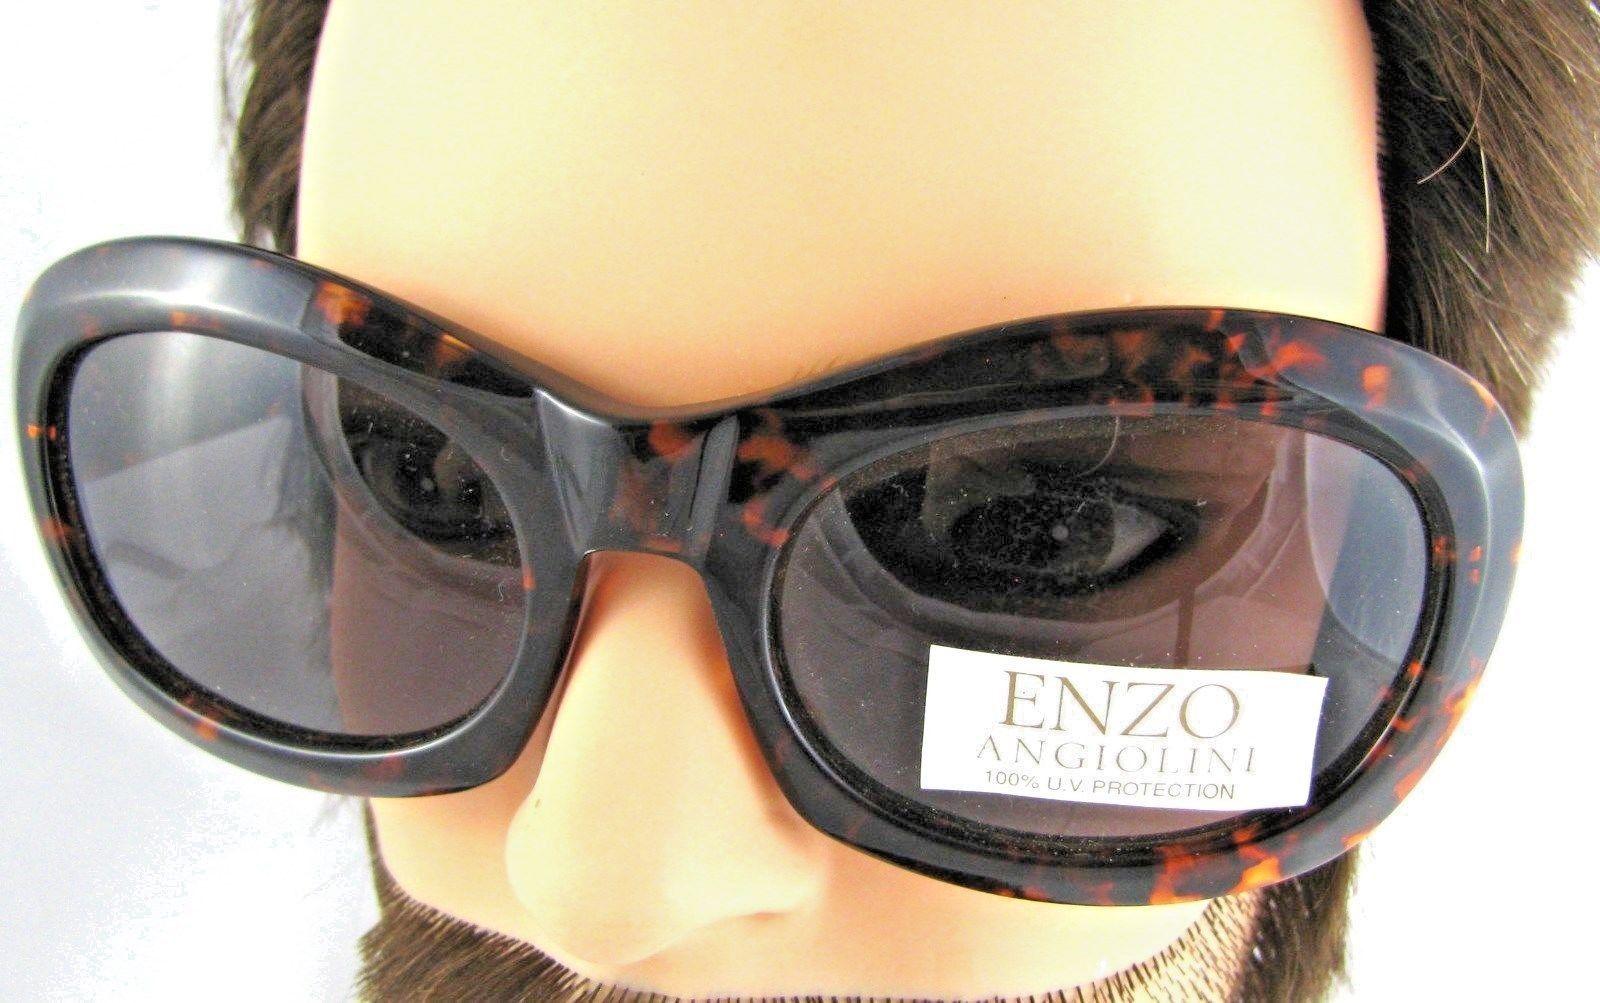 36e055f1bd ... New Vintage Tortoise Sunglasses Enzo Angionili Brown Black Riviera 100%  UV Prot